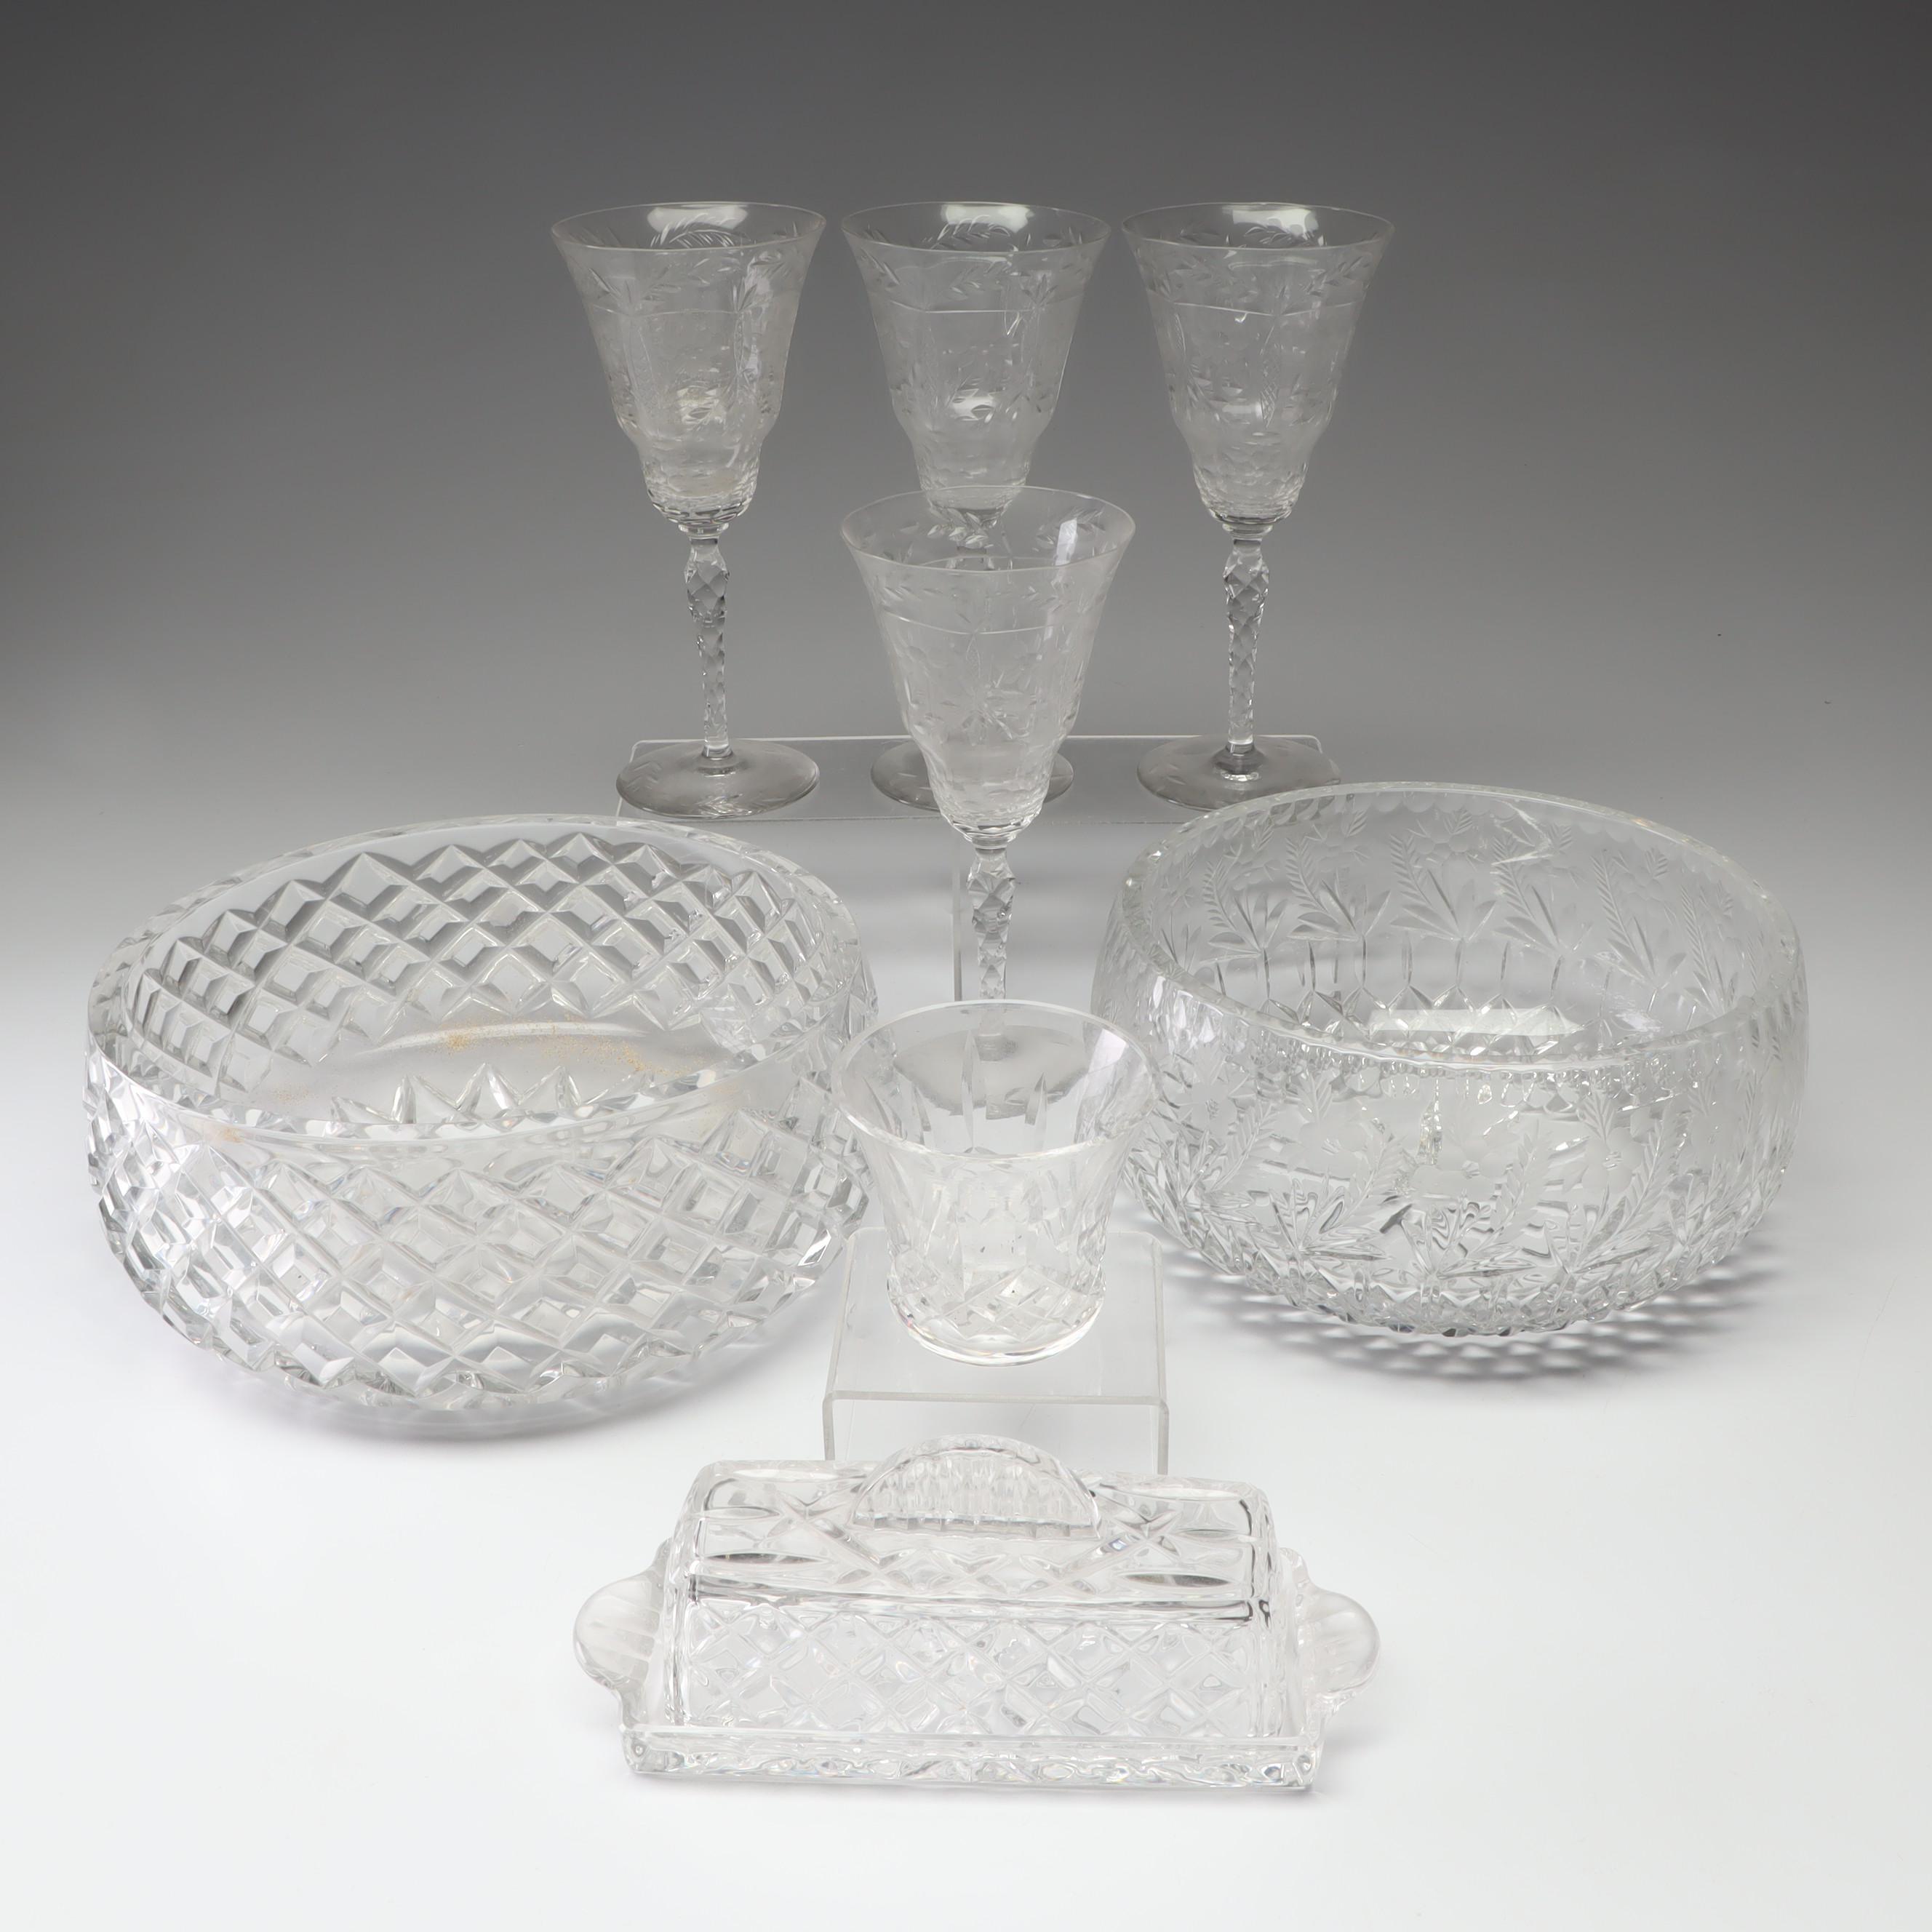 Cut Crystal Stemware and Serveware